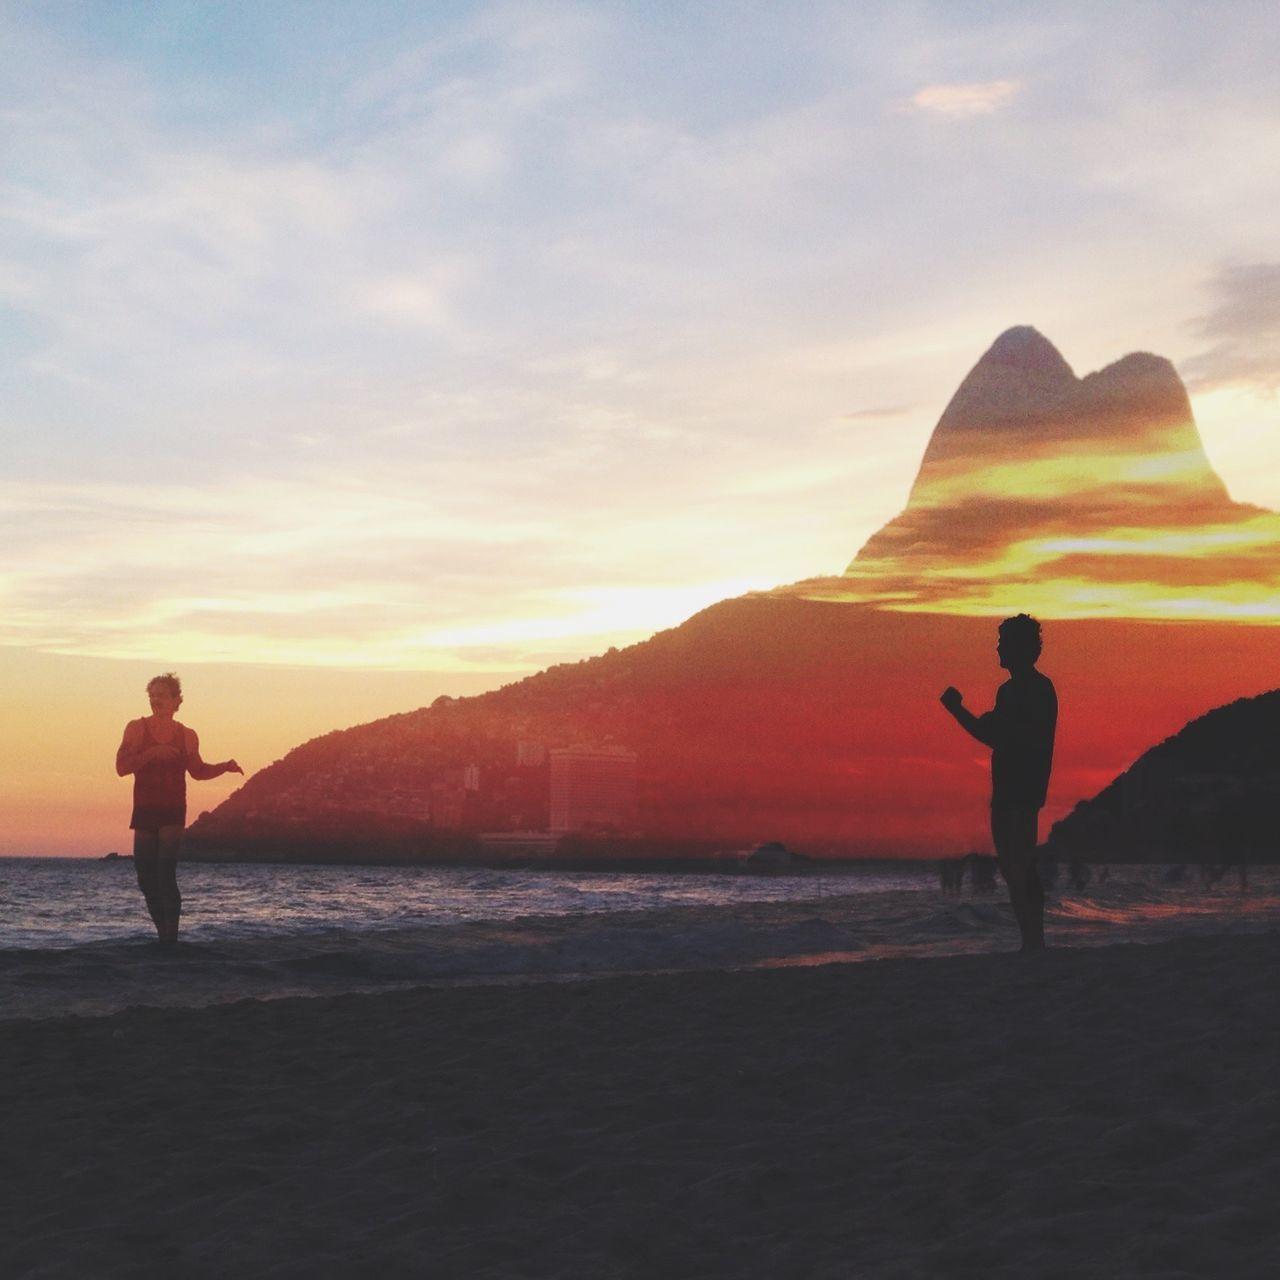 Sometimes I talk to myself... Leblon Beach EyeEm Brasil EyeEm Rio EyeEm Ambassador Sunset Silhouettes Superimpose Silhouette Hombrecitos Ipanema Beach Riodejaneiro